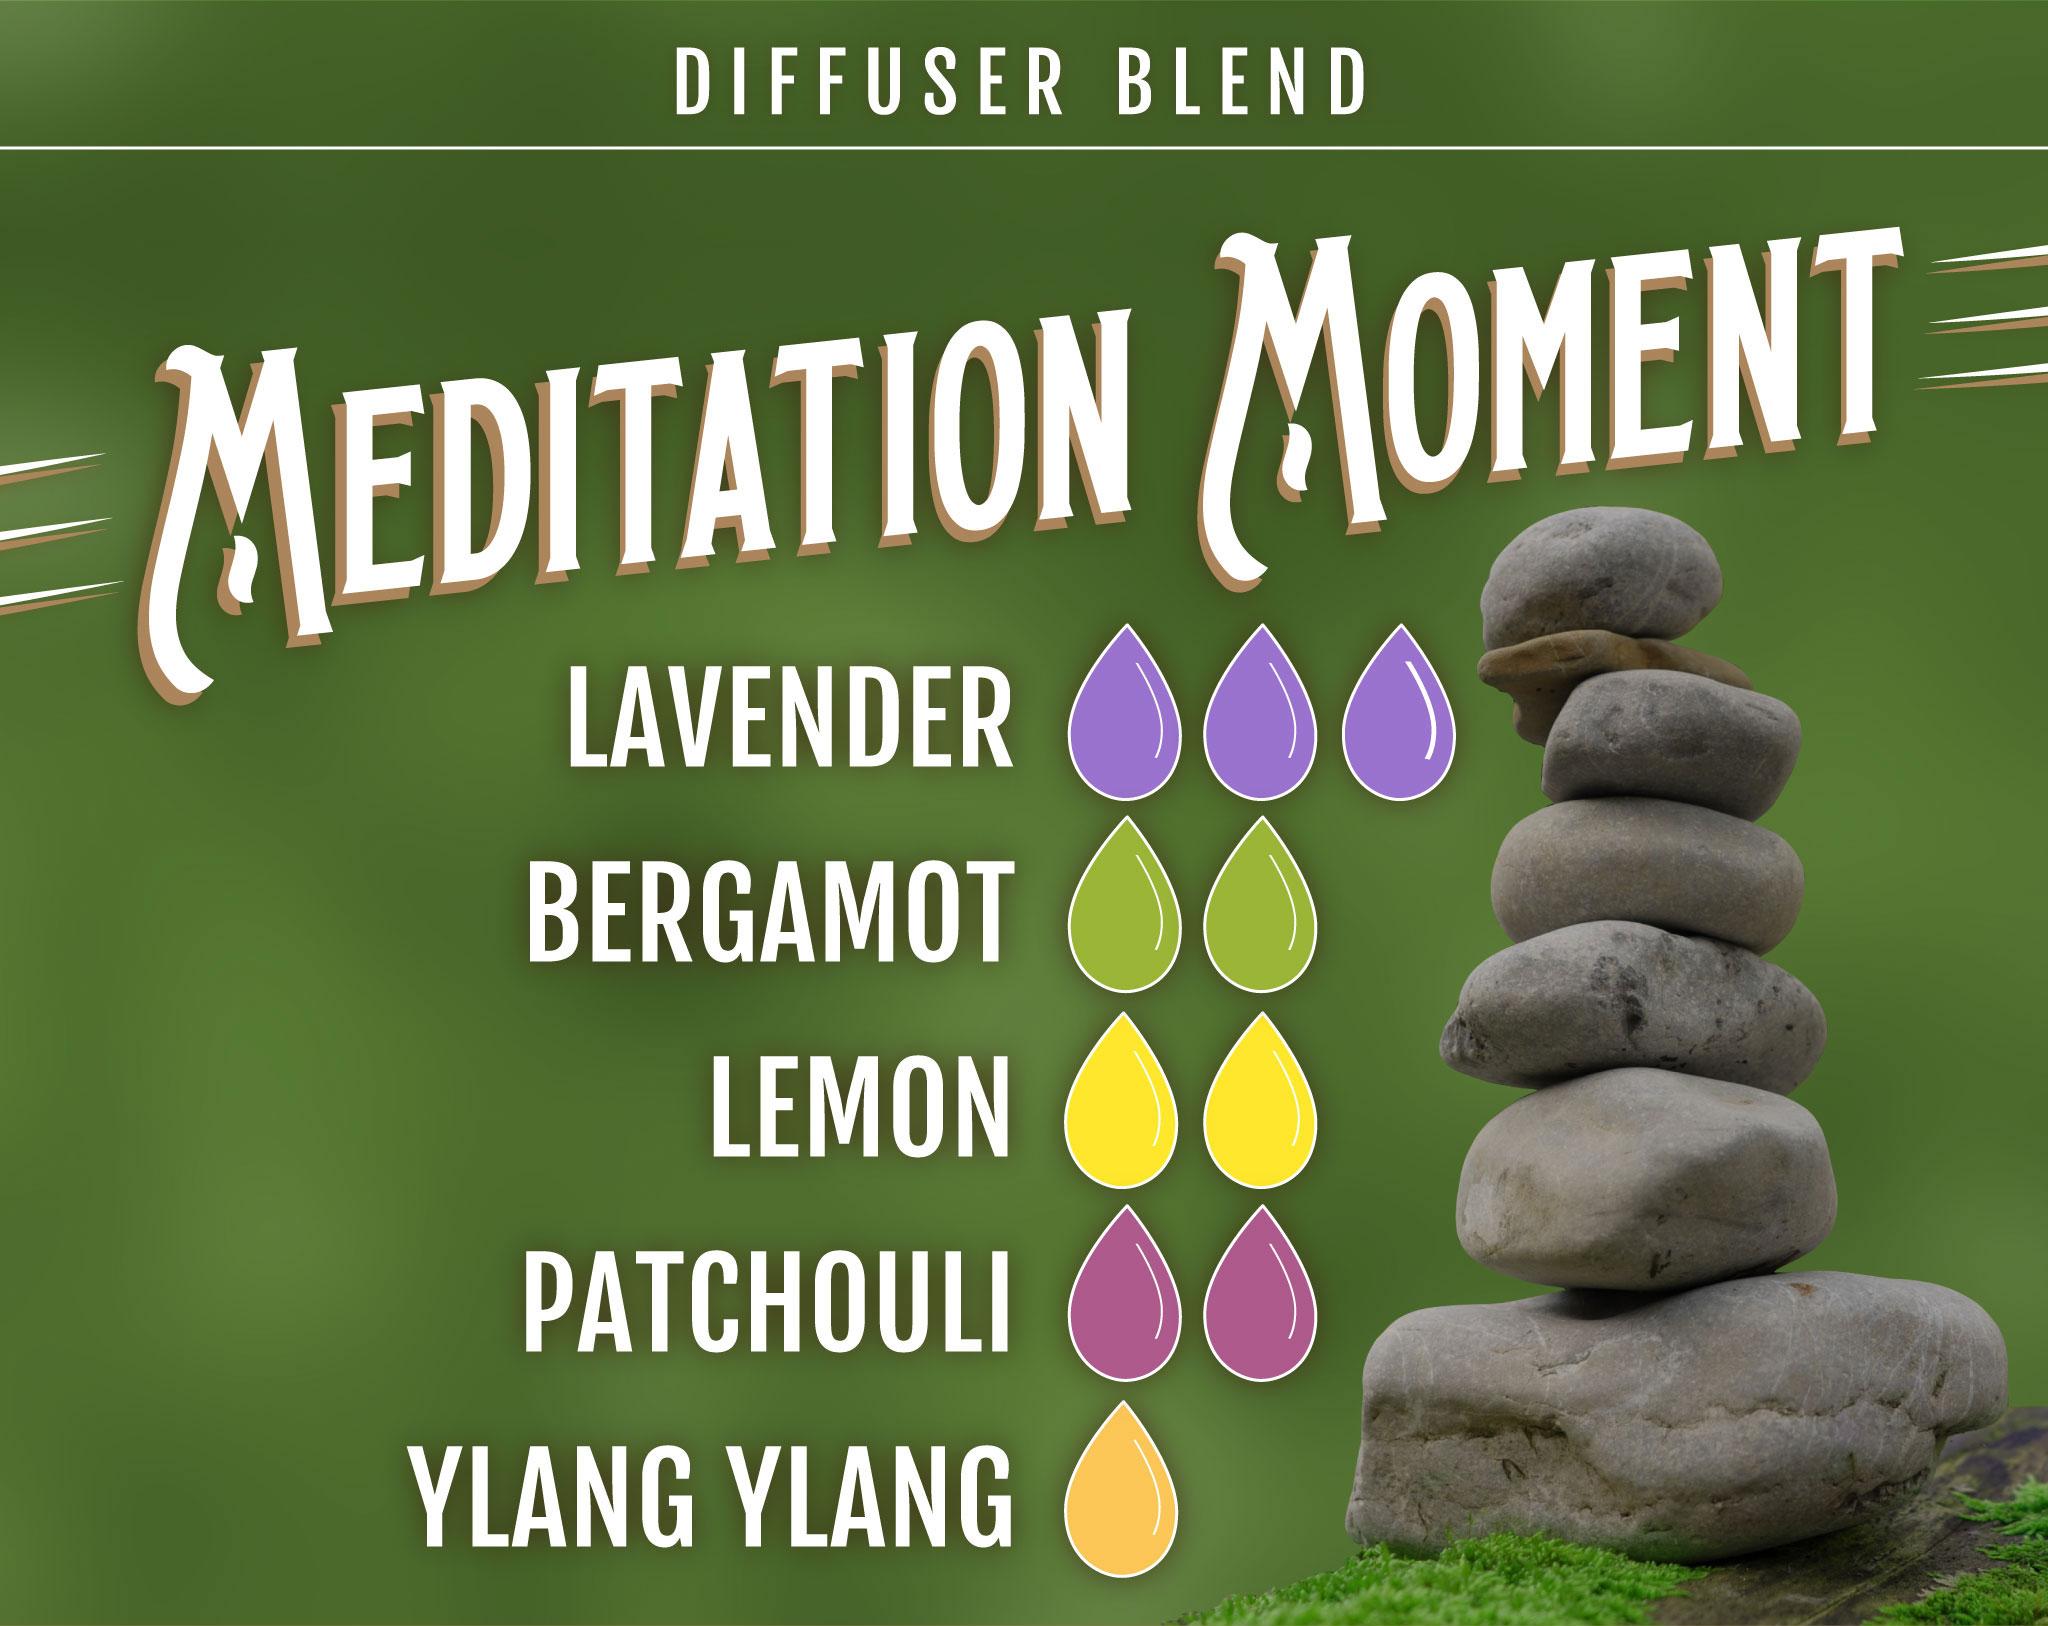 Lavender Essential Oil Diffuser Blend - Meditation Moment - 3 drops Lavender, 2 drops Bergamot, 2 drops Lemon, 2 drops Patchchouli, 1 drop Ylang Ylang